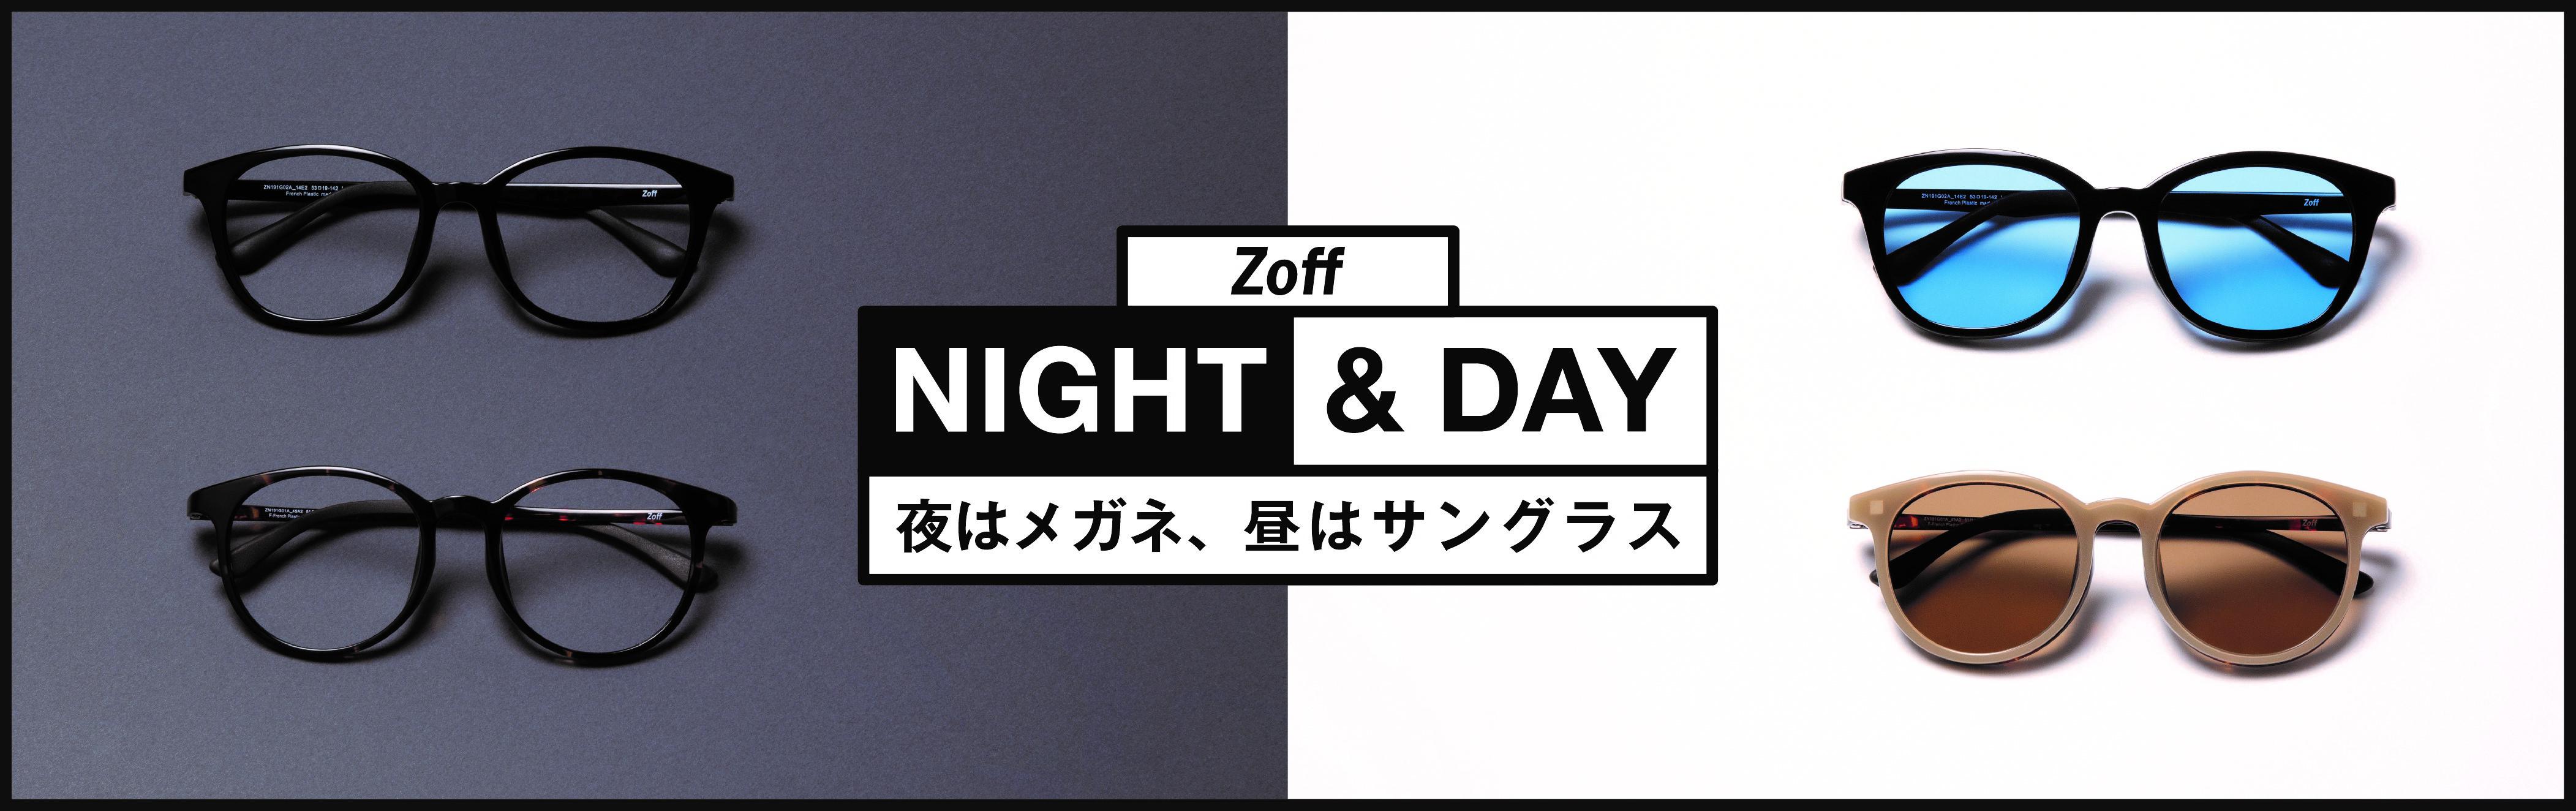 "【Zoff】夜はメガネ、昼はサングラス""Zoff NIGHT&DAY""がリニューア ル!"